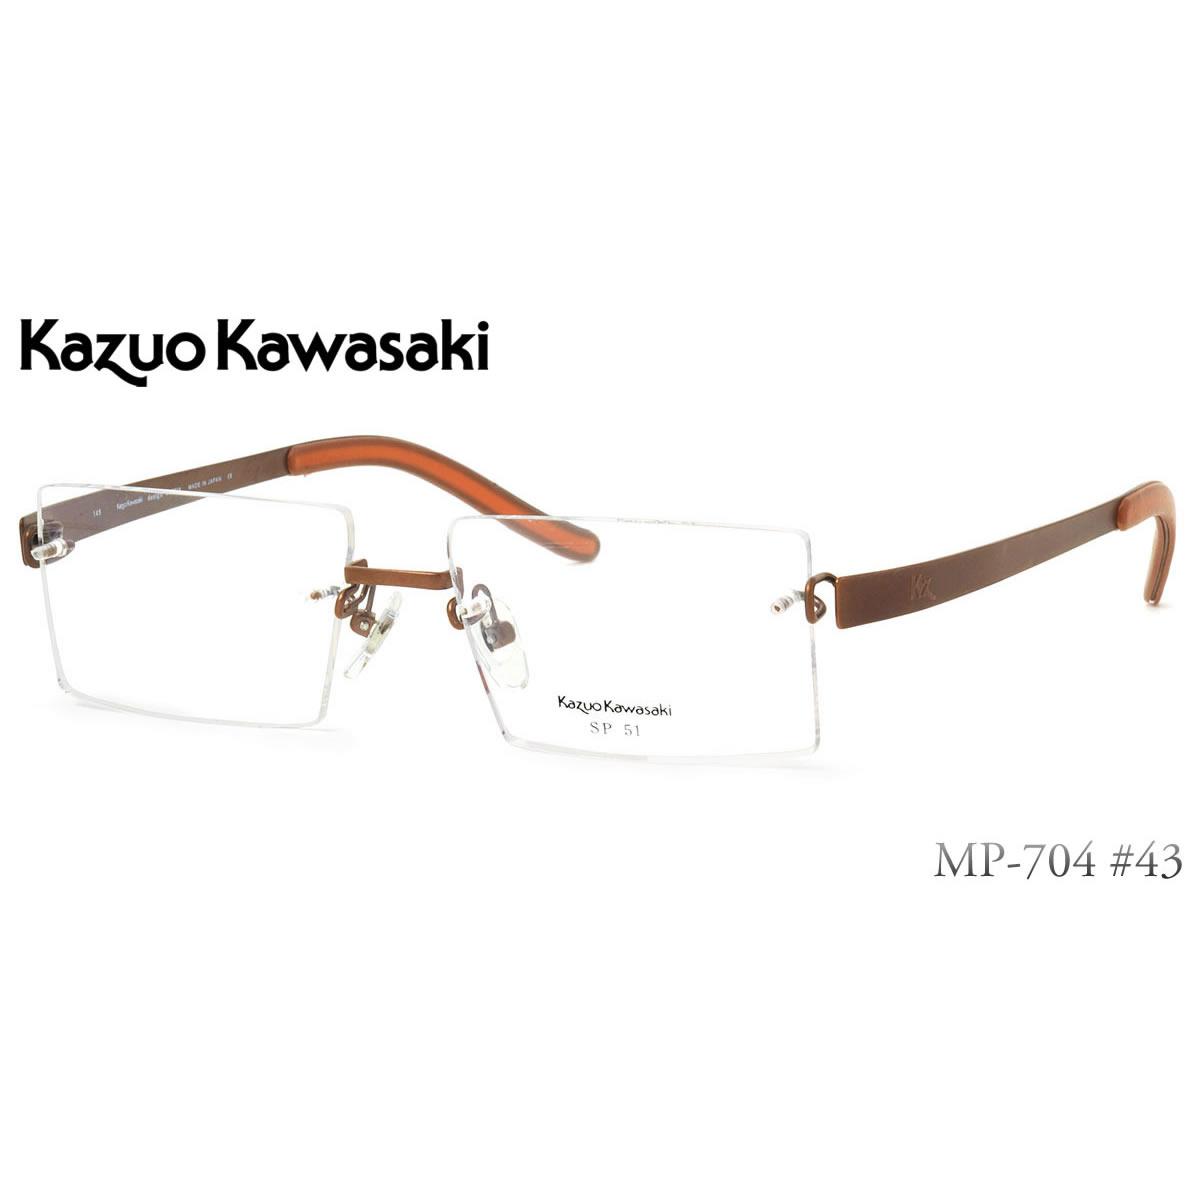 KAZUO KAWASAKI メガネ カワサキカズオ メガネフレーム MP704 43 51サイズ